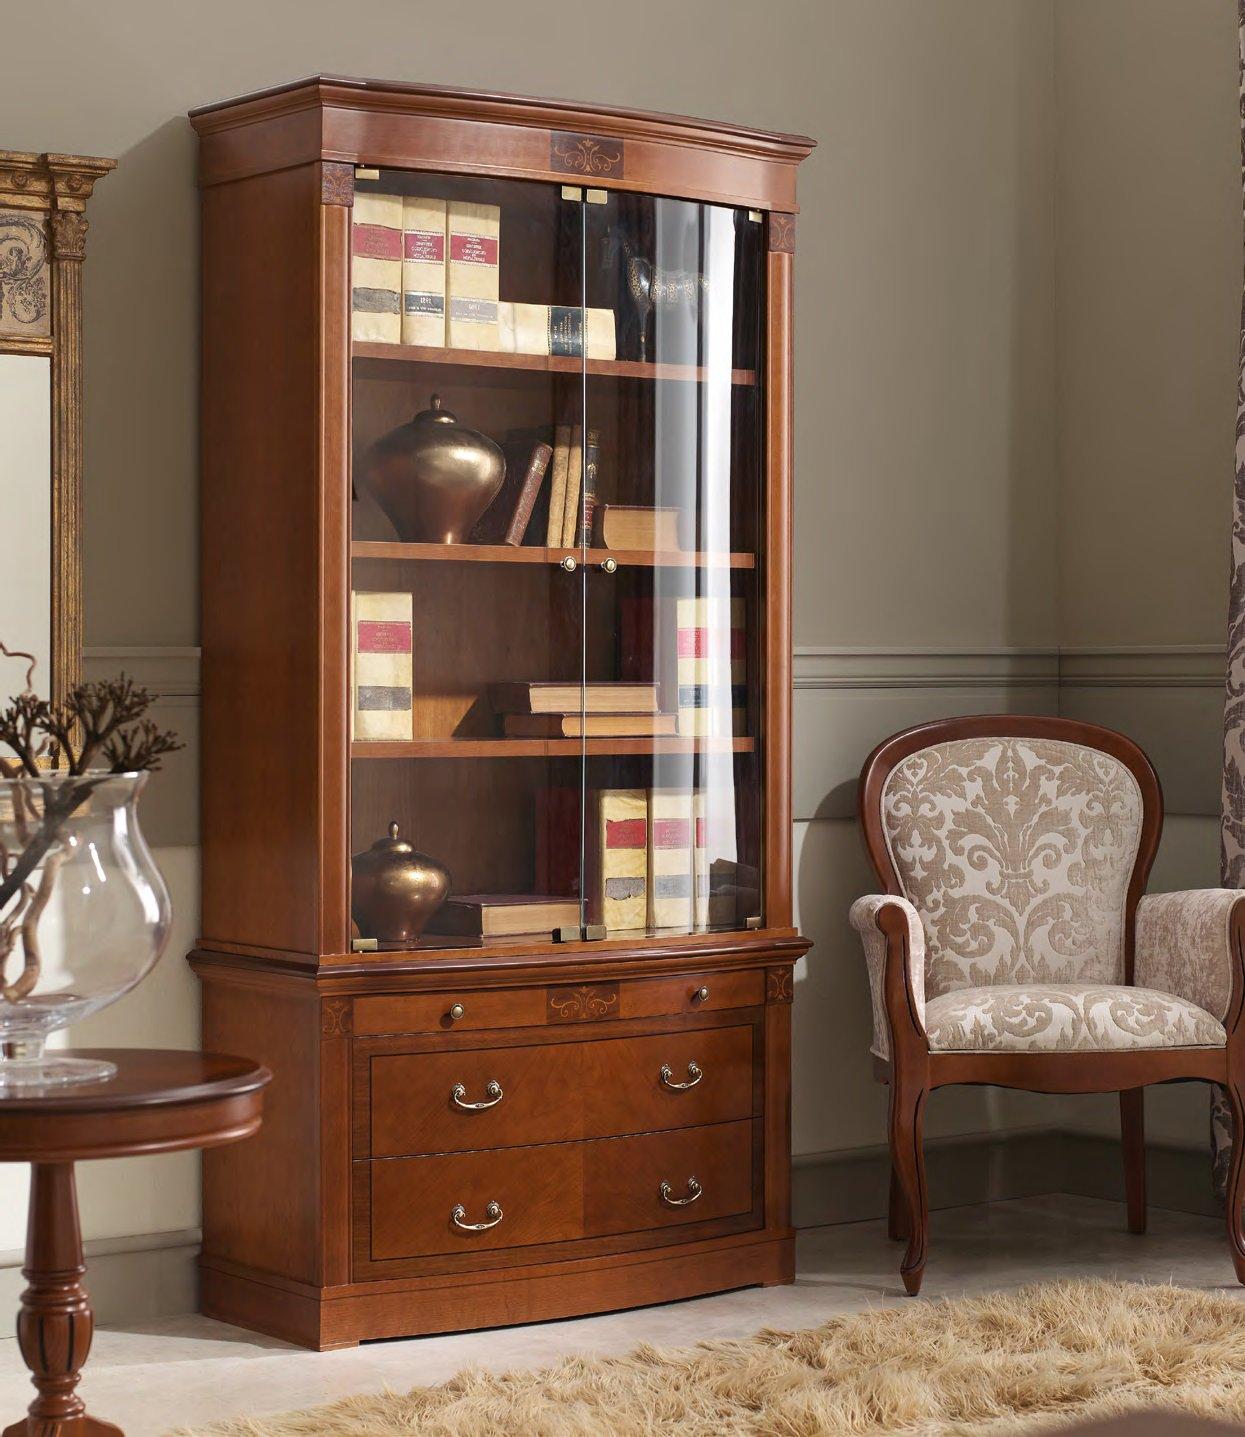 Книжный шкаф panamar 825.001.p в мебельных салонах le tabour.